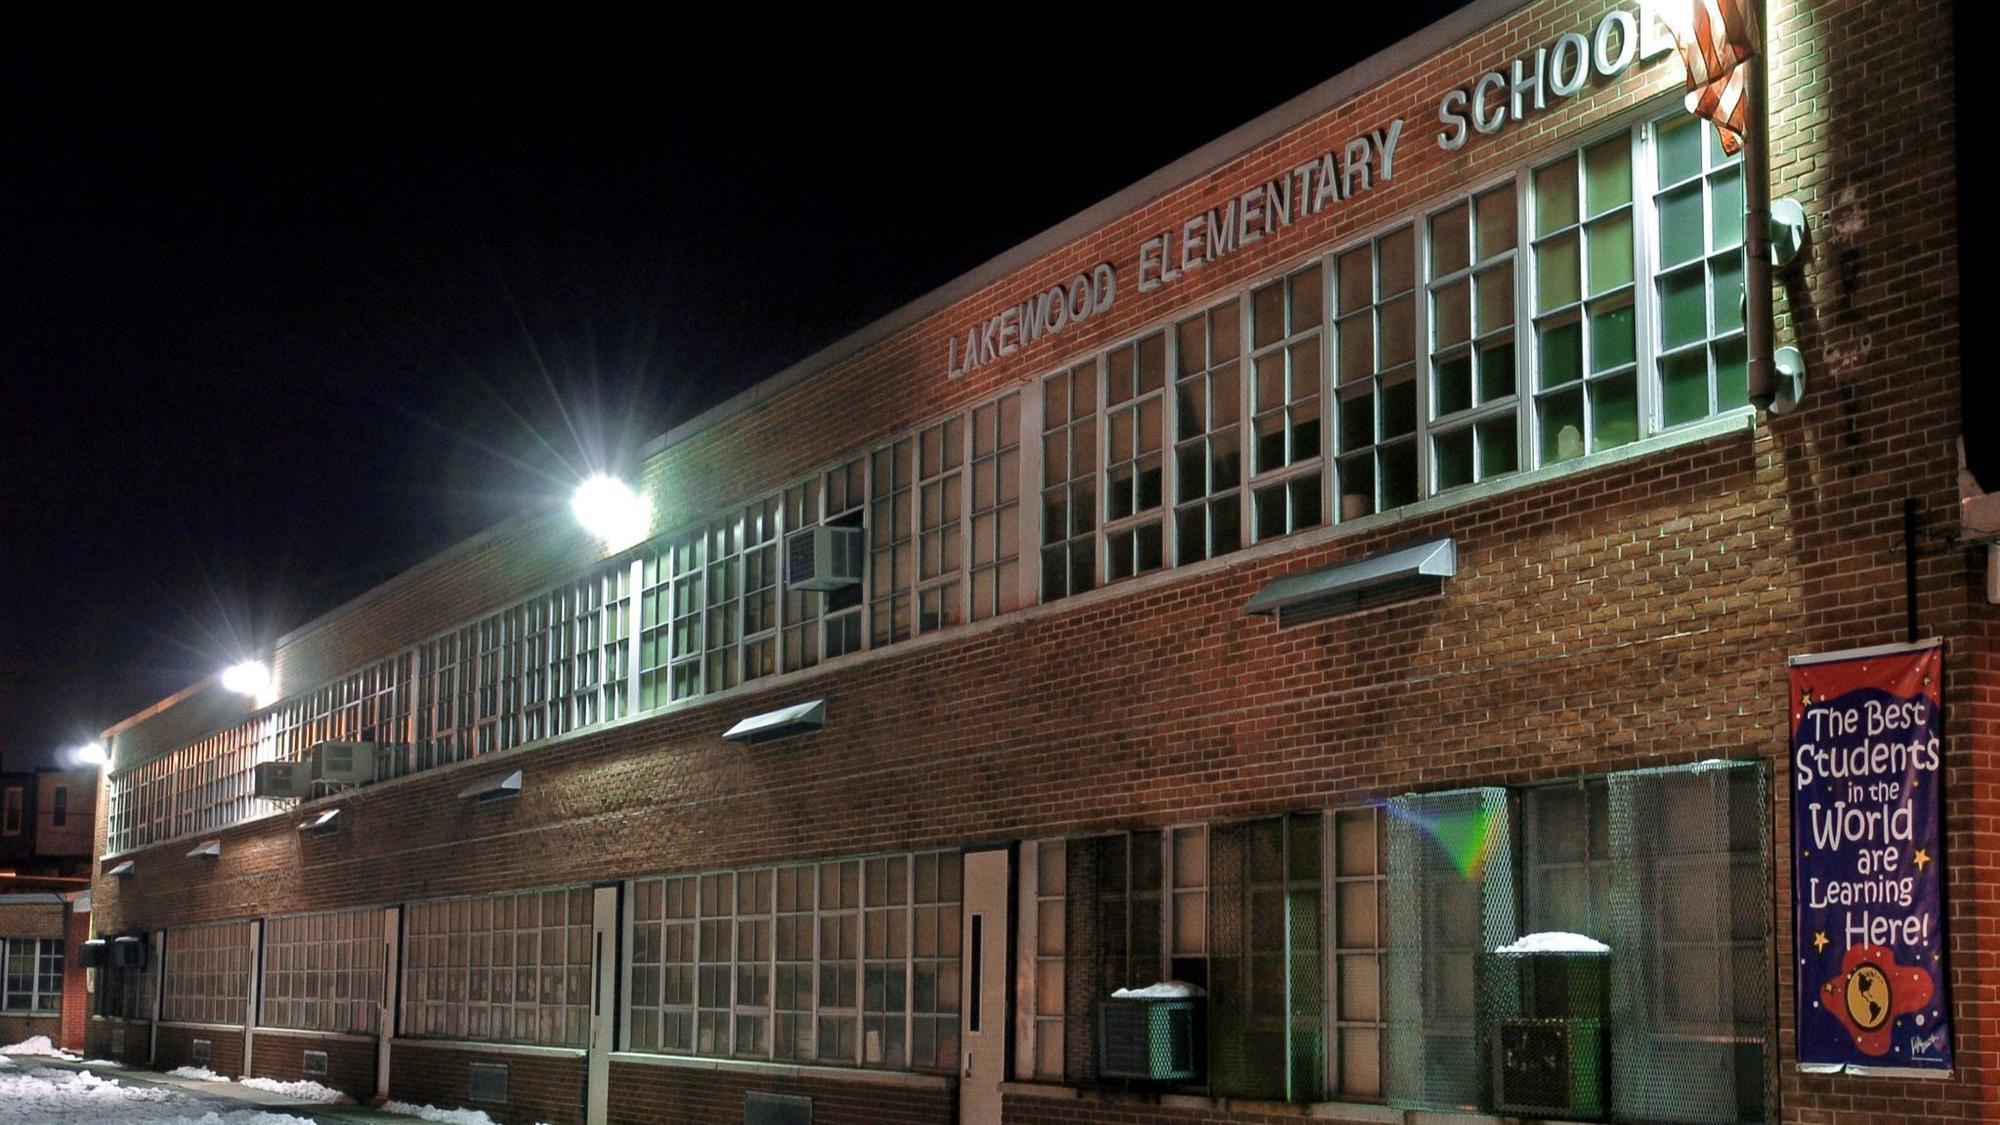 Bs-sp-ravens-baltimore-schools-donation-20181203